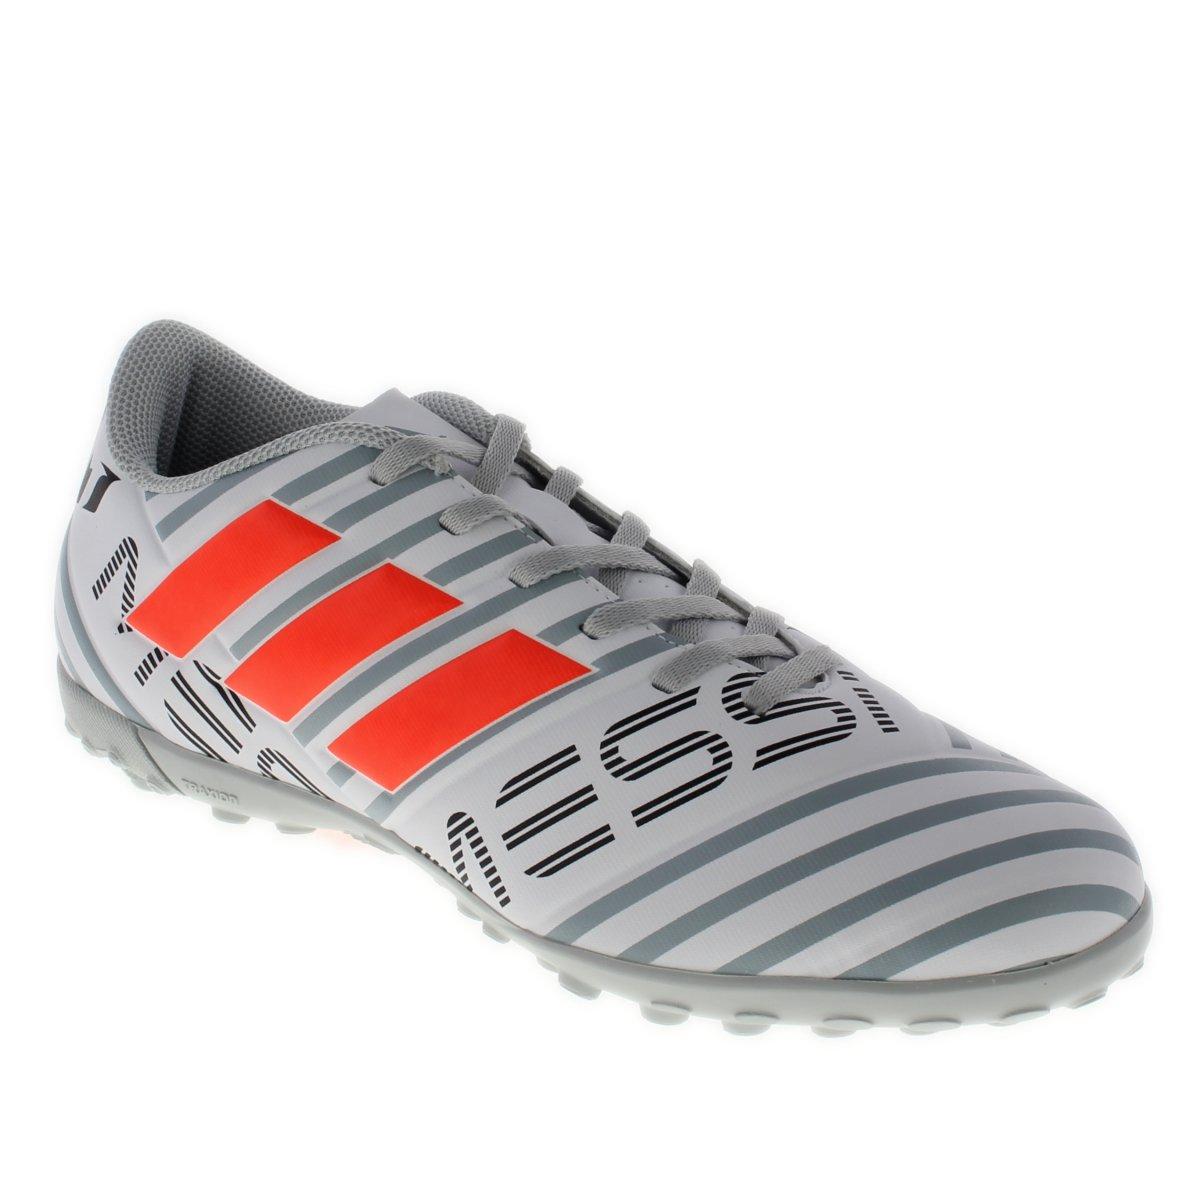 7575c7ea5a Society Adidas Nemeziz Messi 17.4 tf